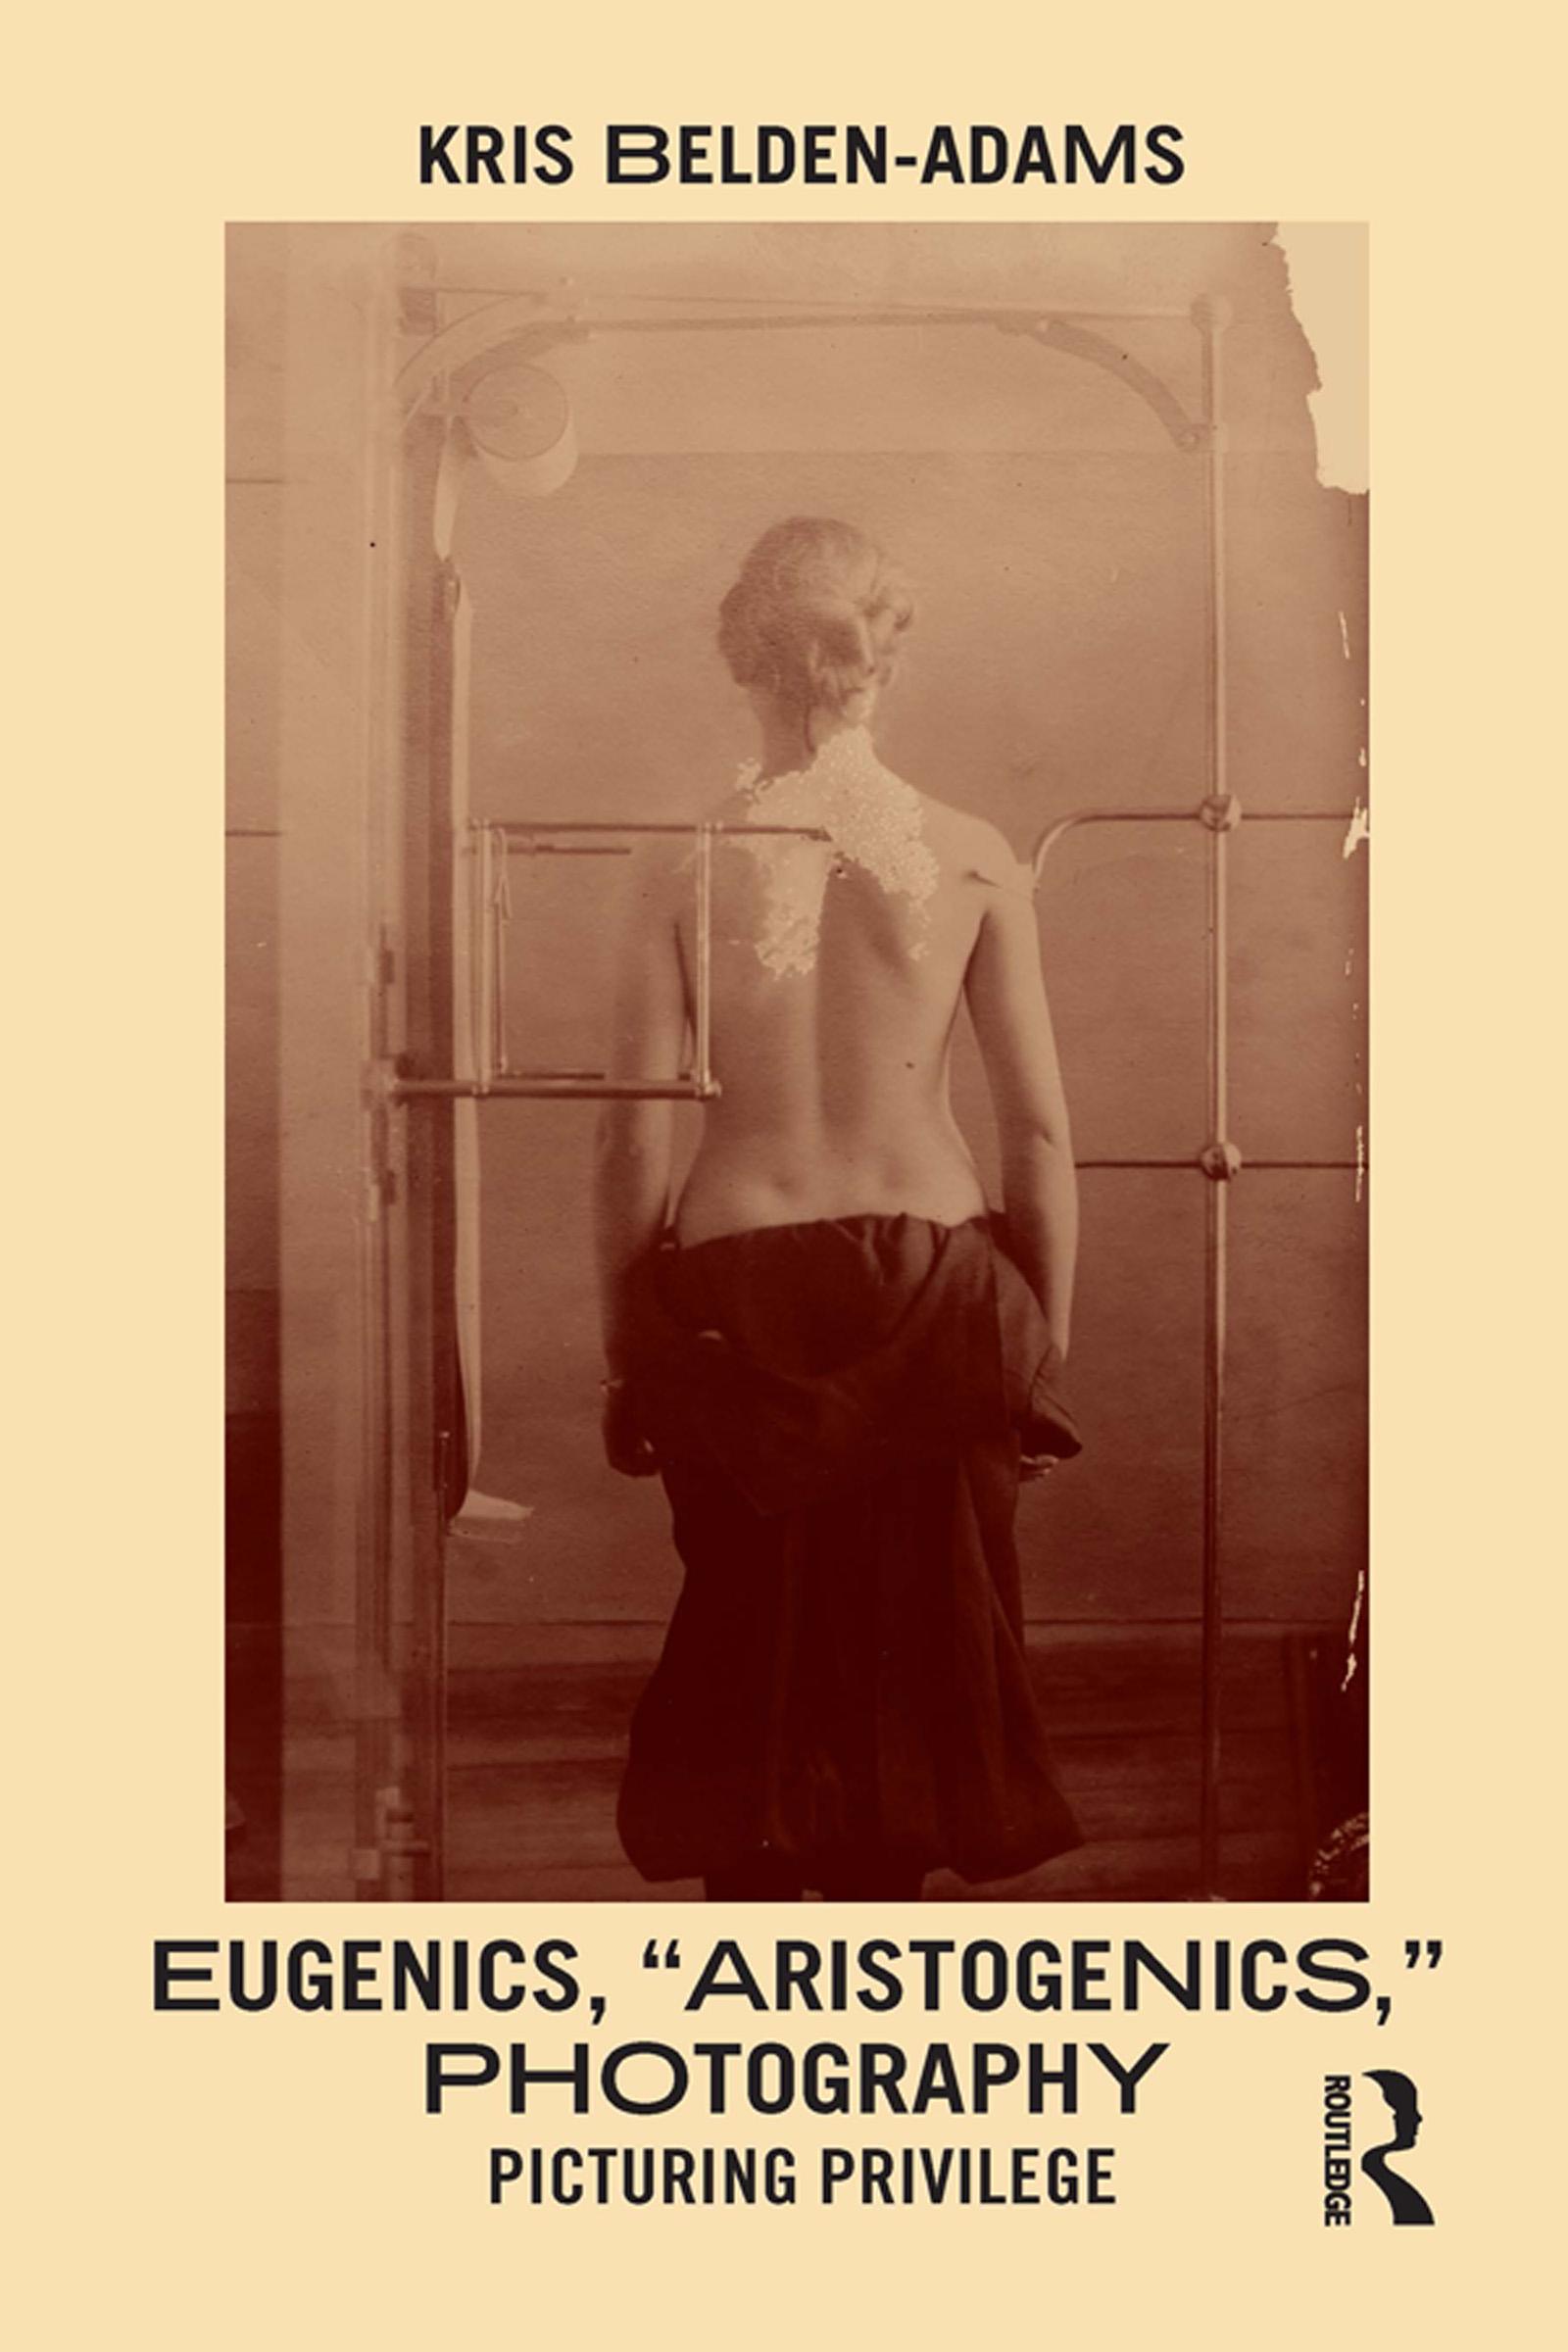 Eugenics, 'Aristogenics', Photography